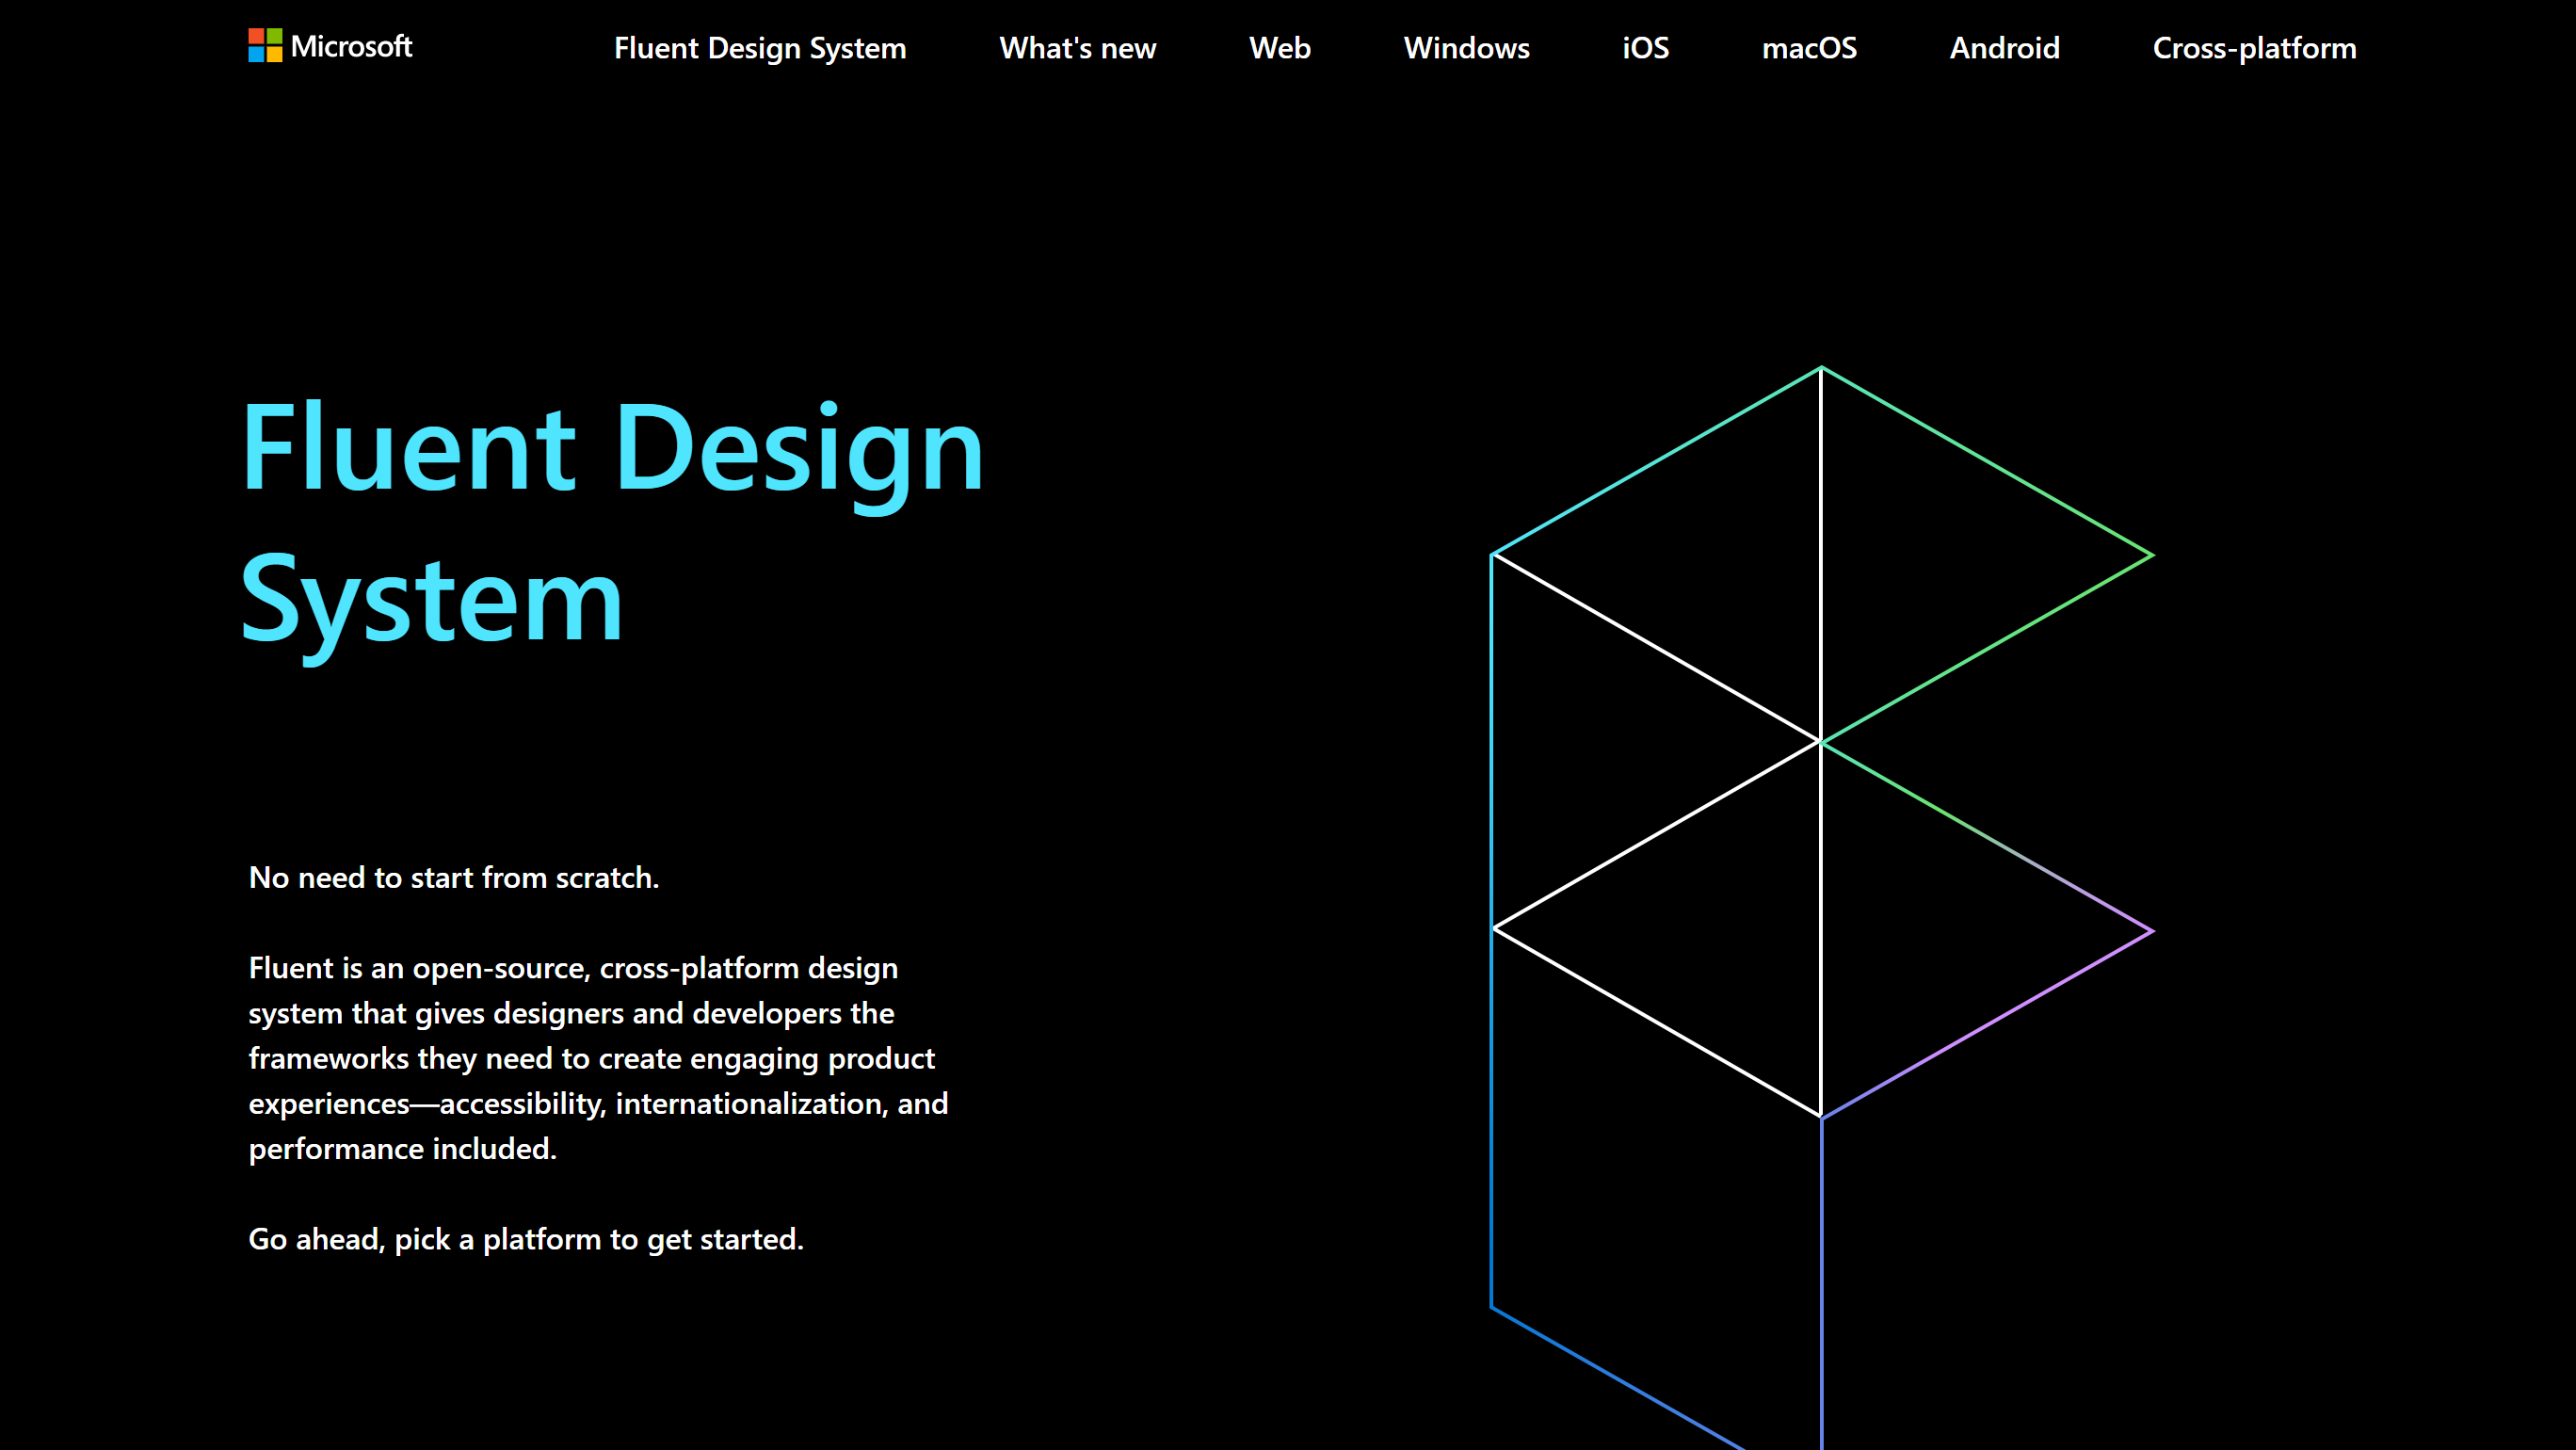 Microsoft,Fluent Design System